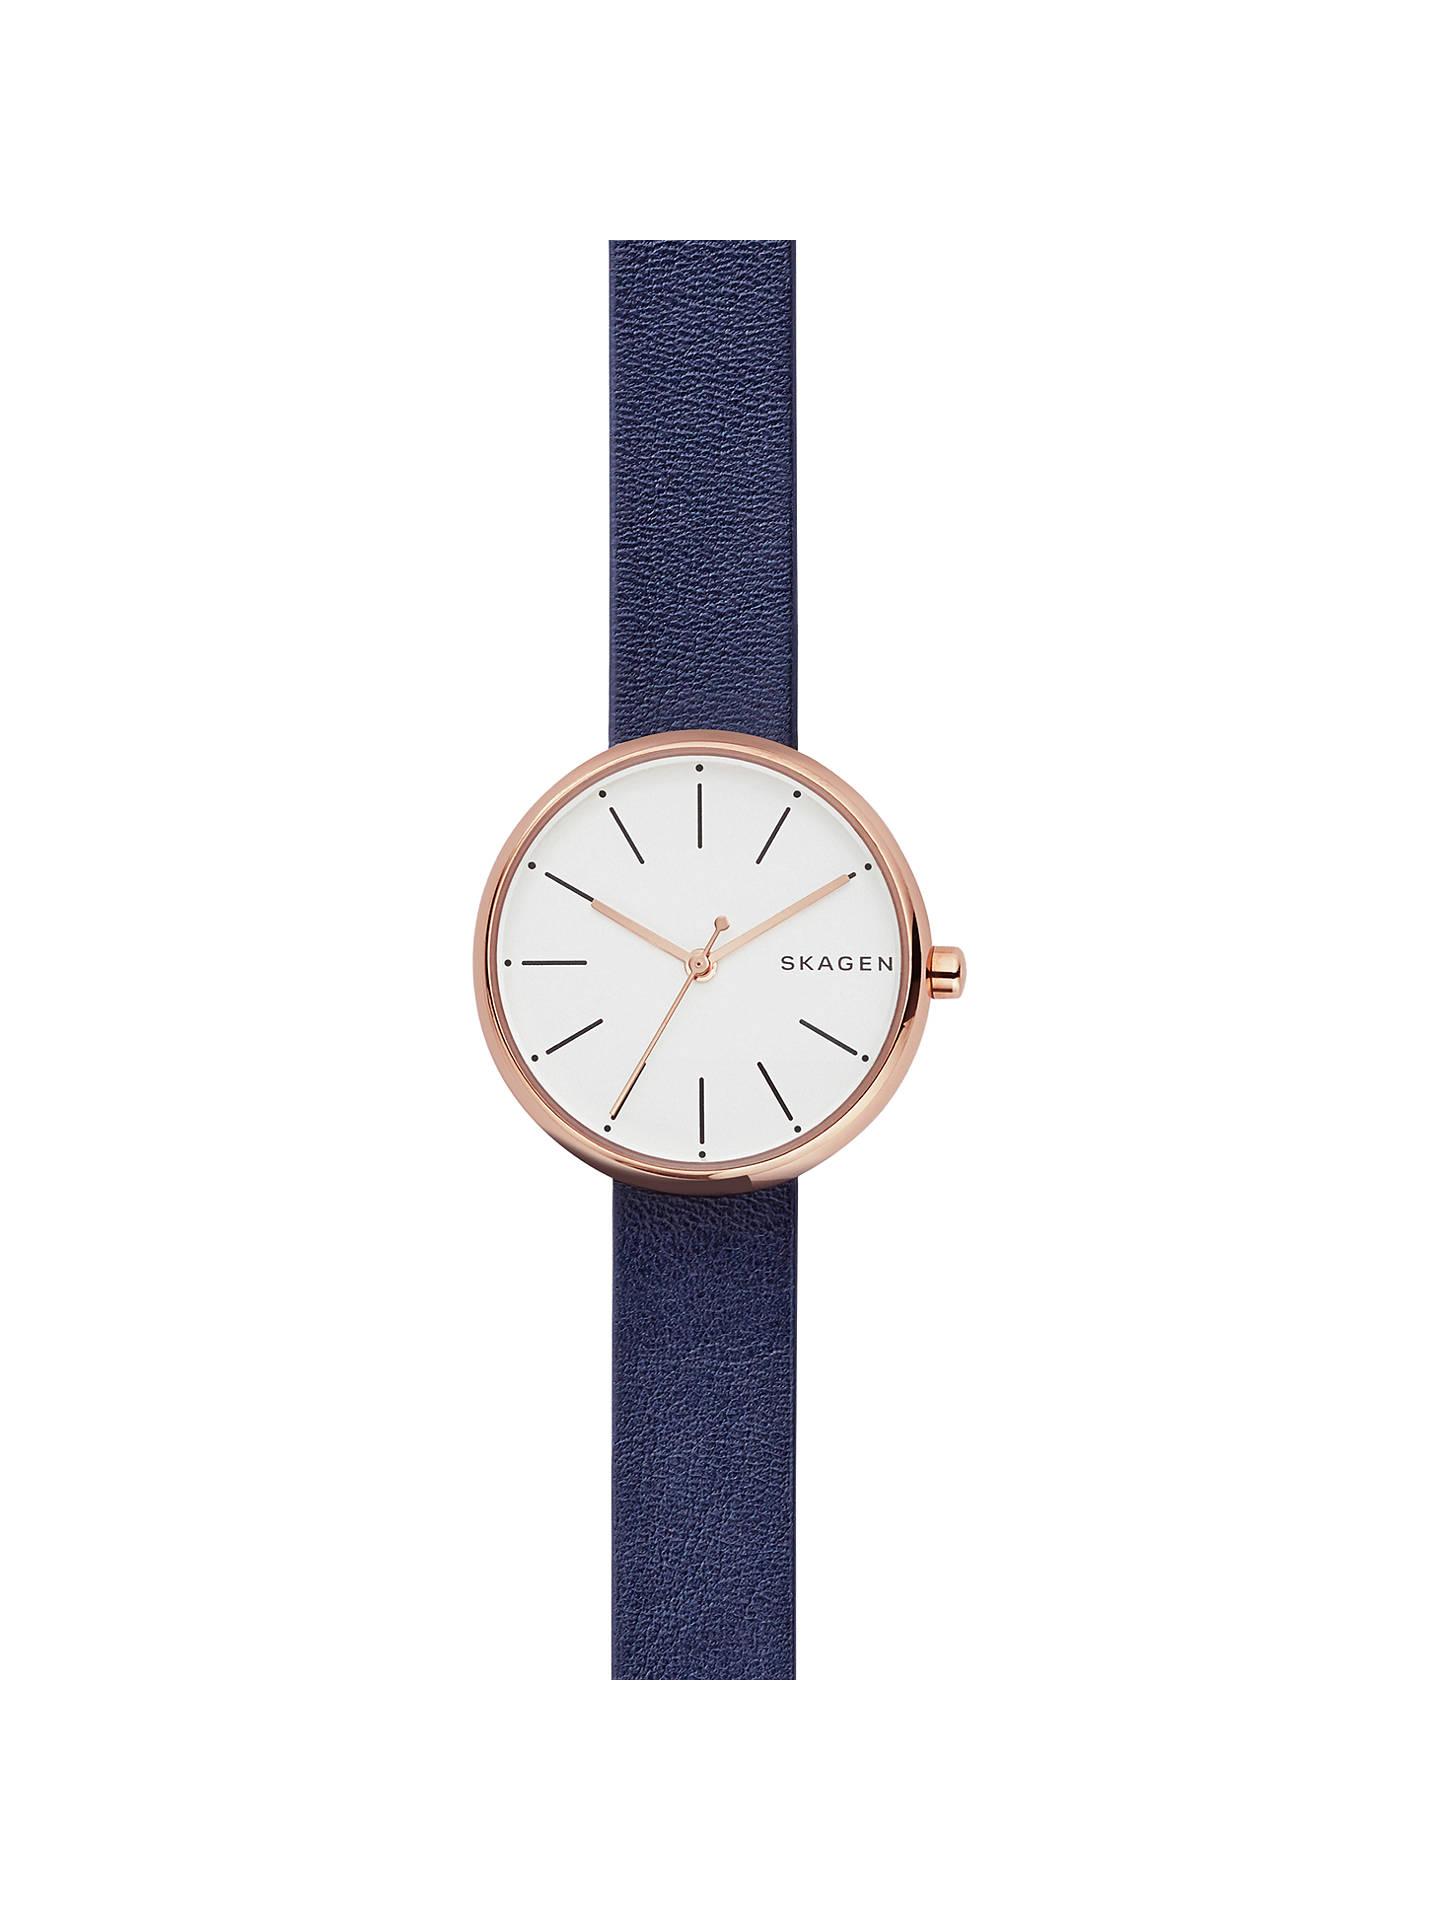 c2e90e9ef Buy Skagen SKW2592 Women's Signatur Leather Strap Watch, Navy/White Online  at johnlewis.